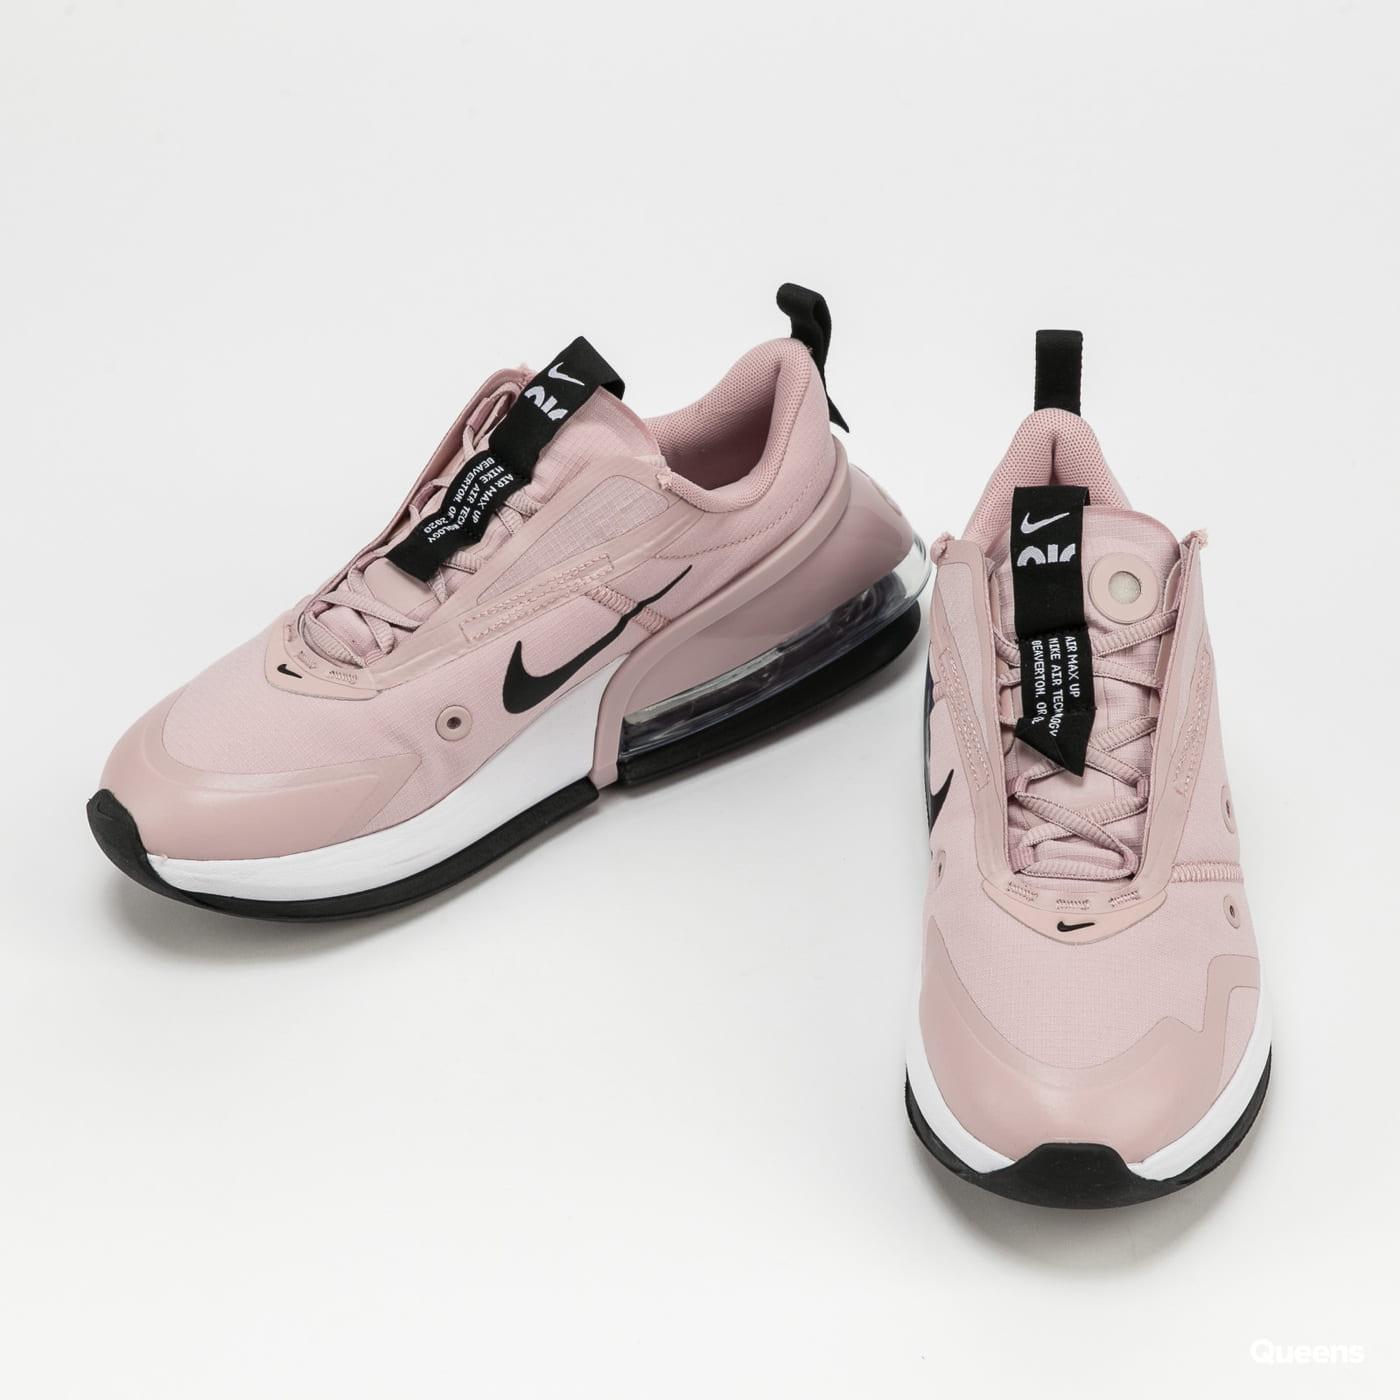 Nike W Air Max Up champagne / white - black